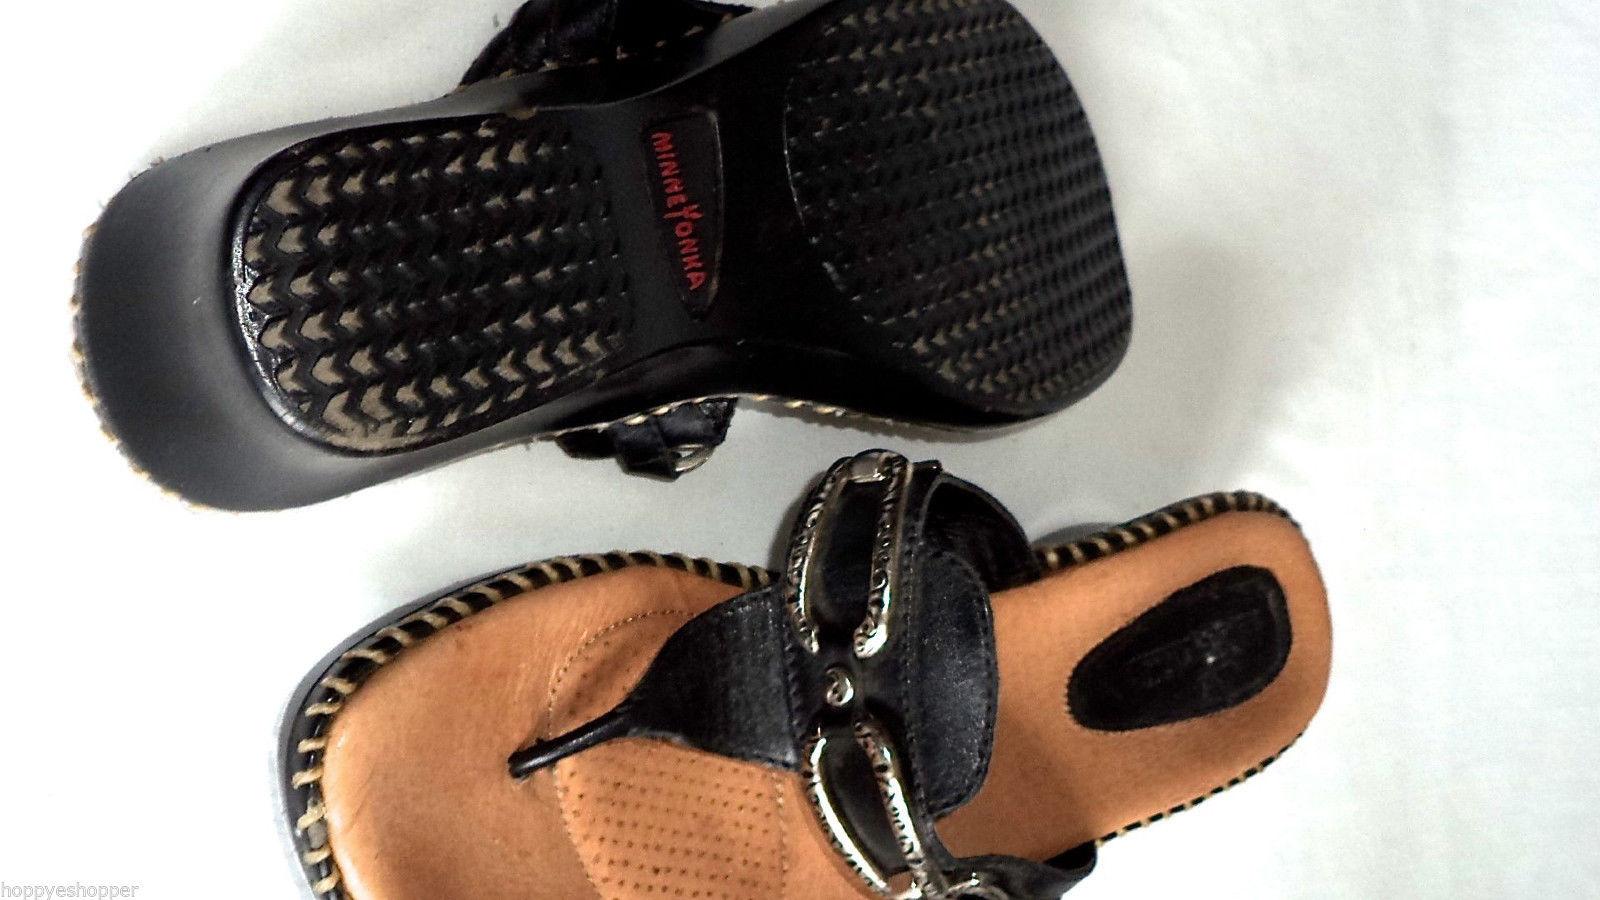 e2f6b2a3da415 MINNETONKA sandals flip flops leather low and 50 similar items